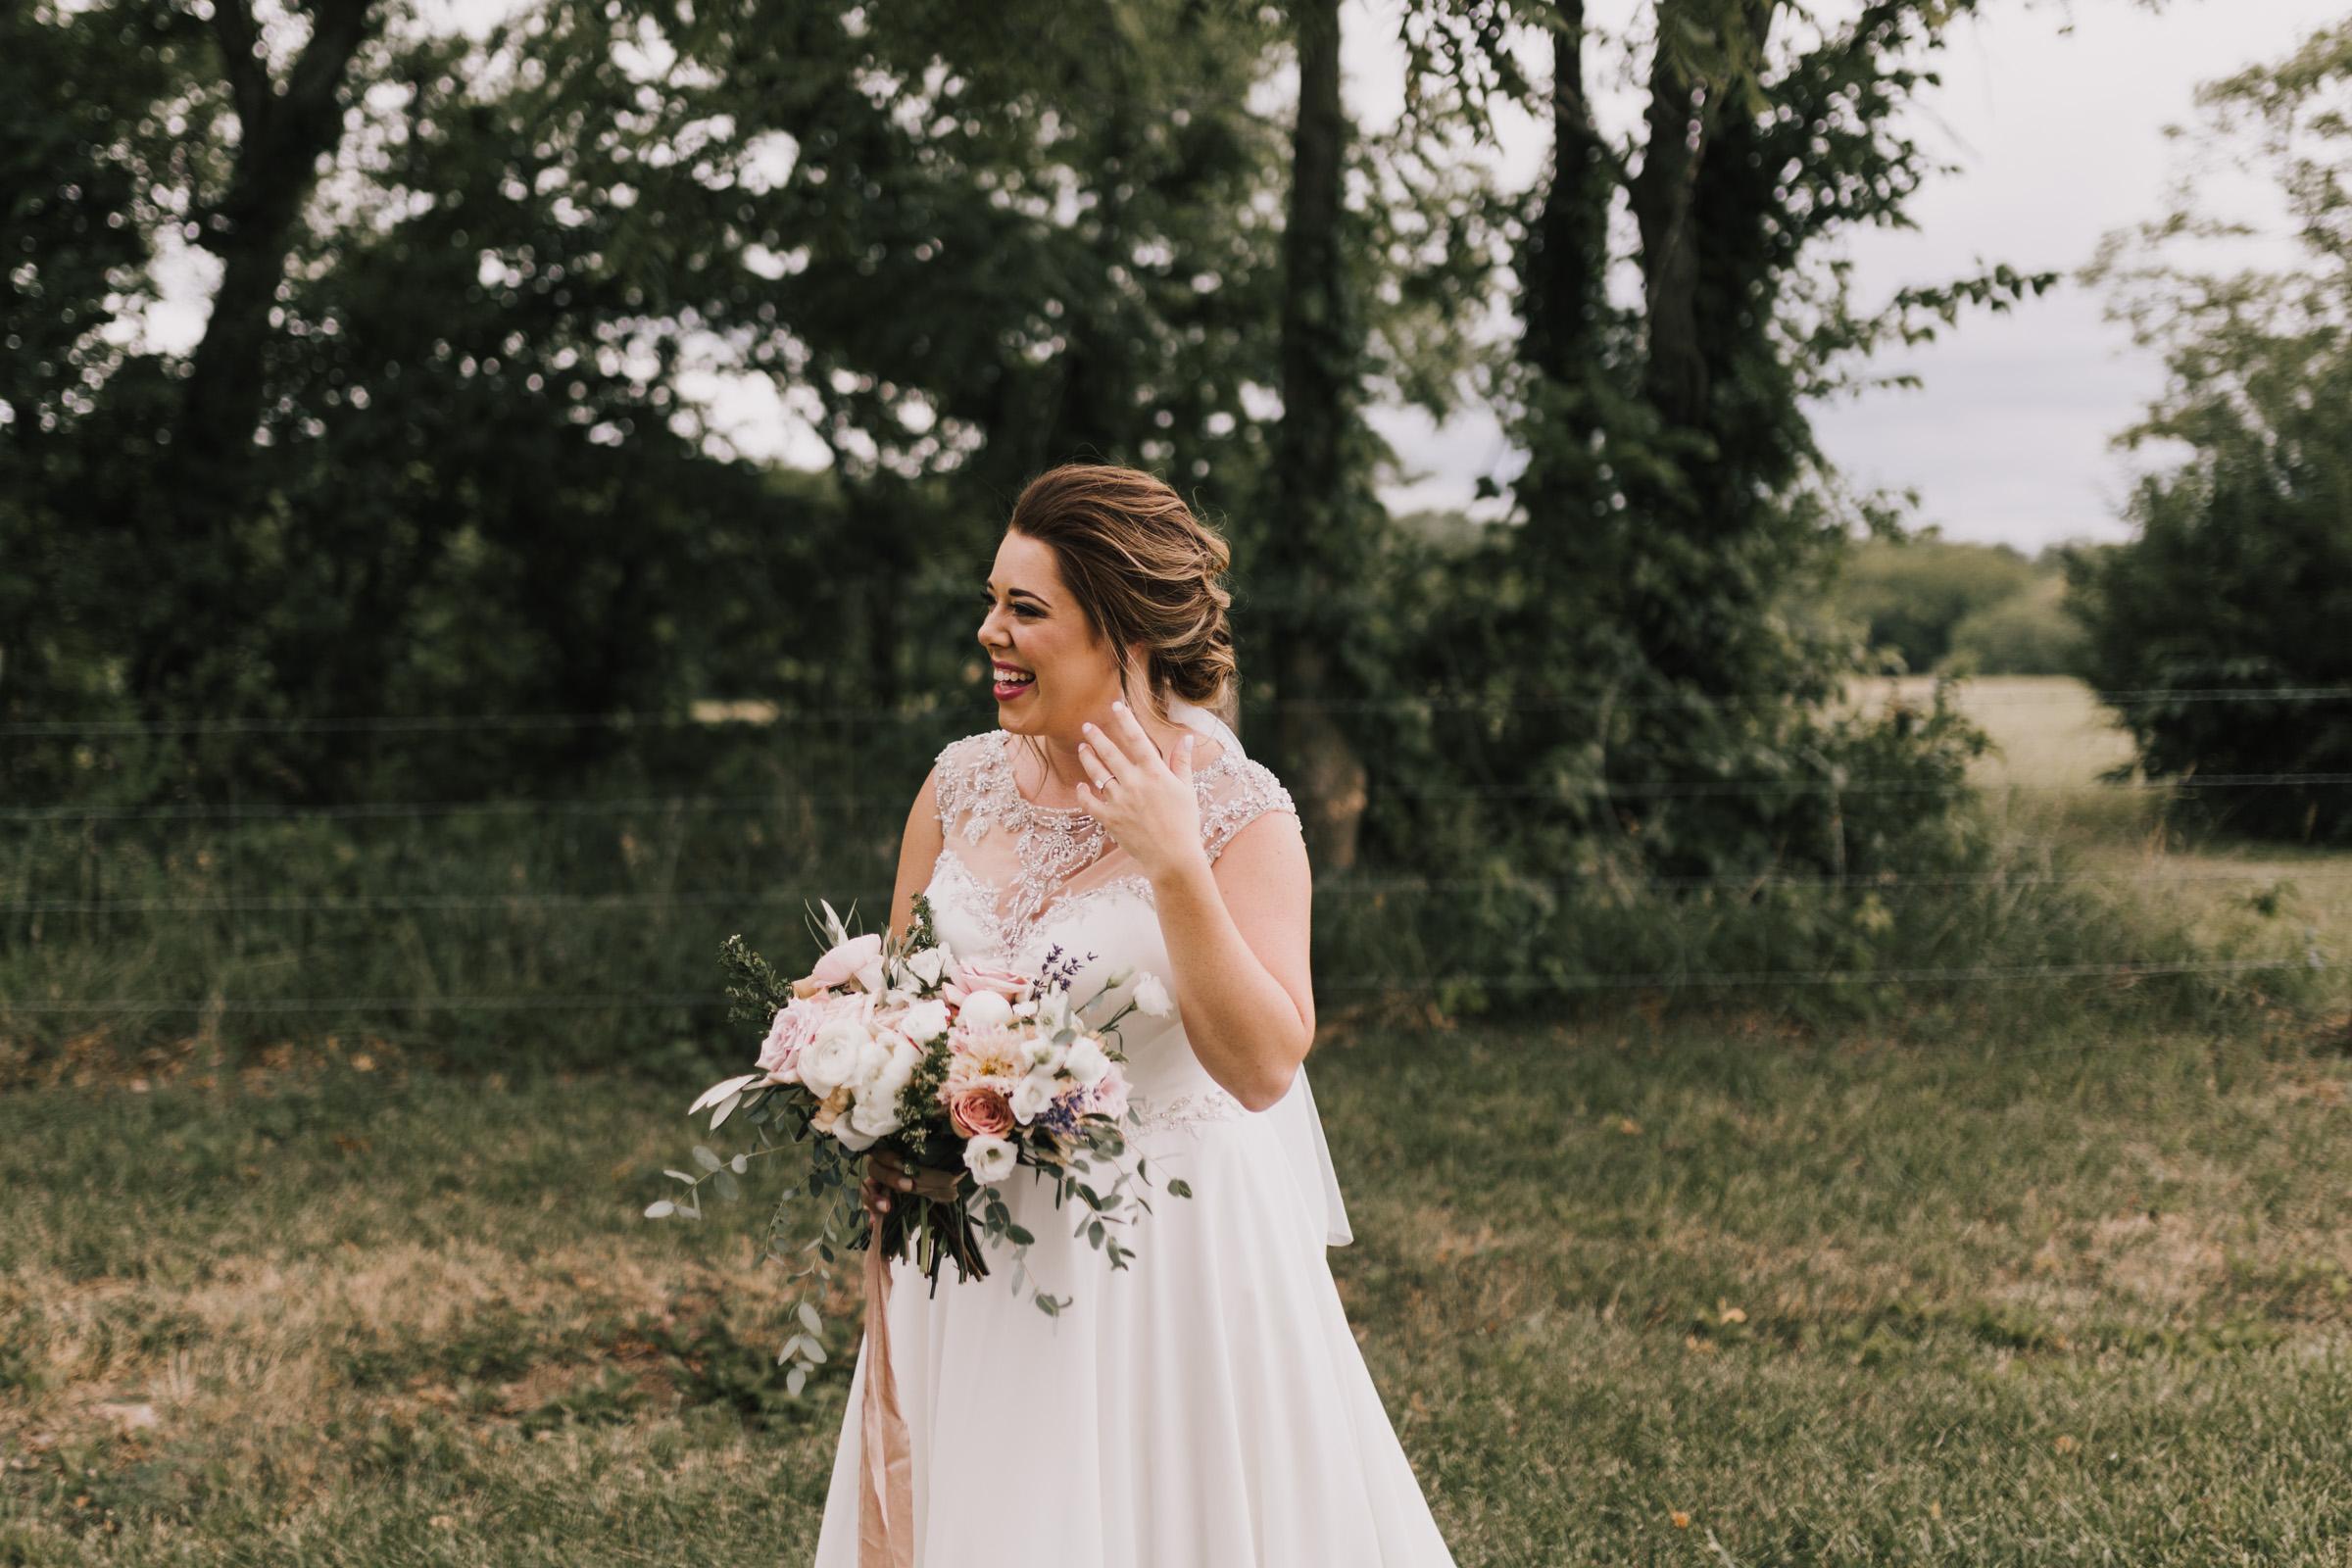 alyssa barletter photography summer odessa missouri wedding kansas city photographer-45.jpg